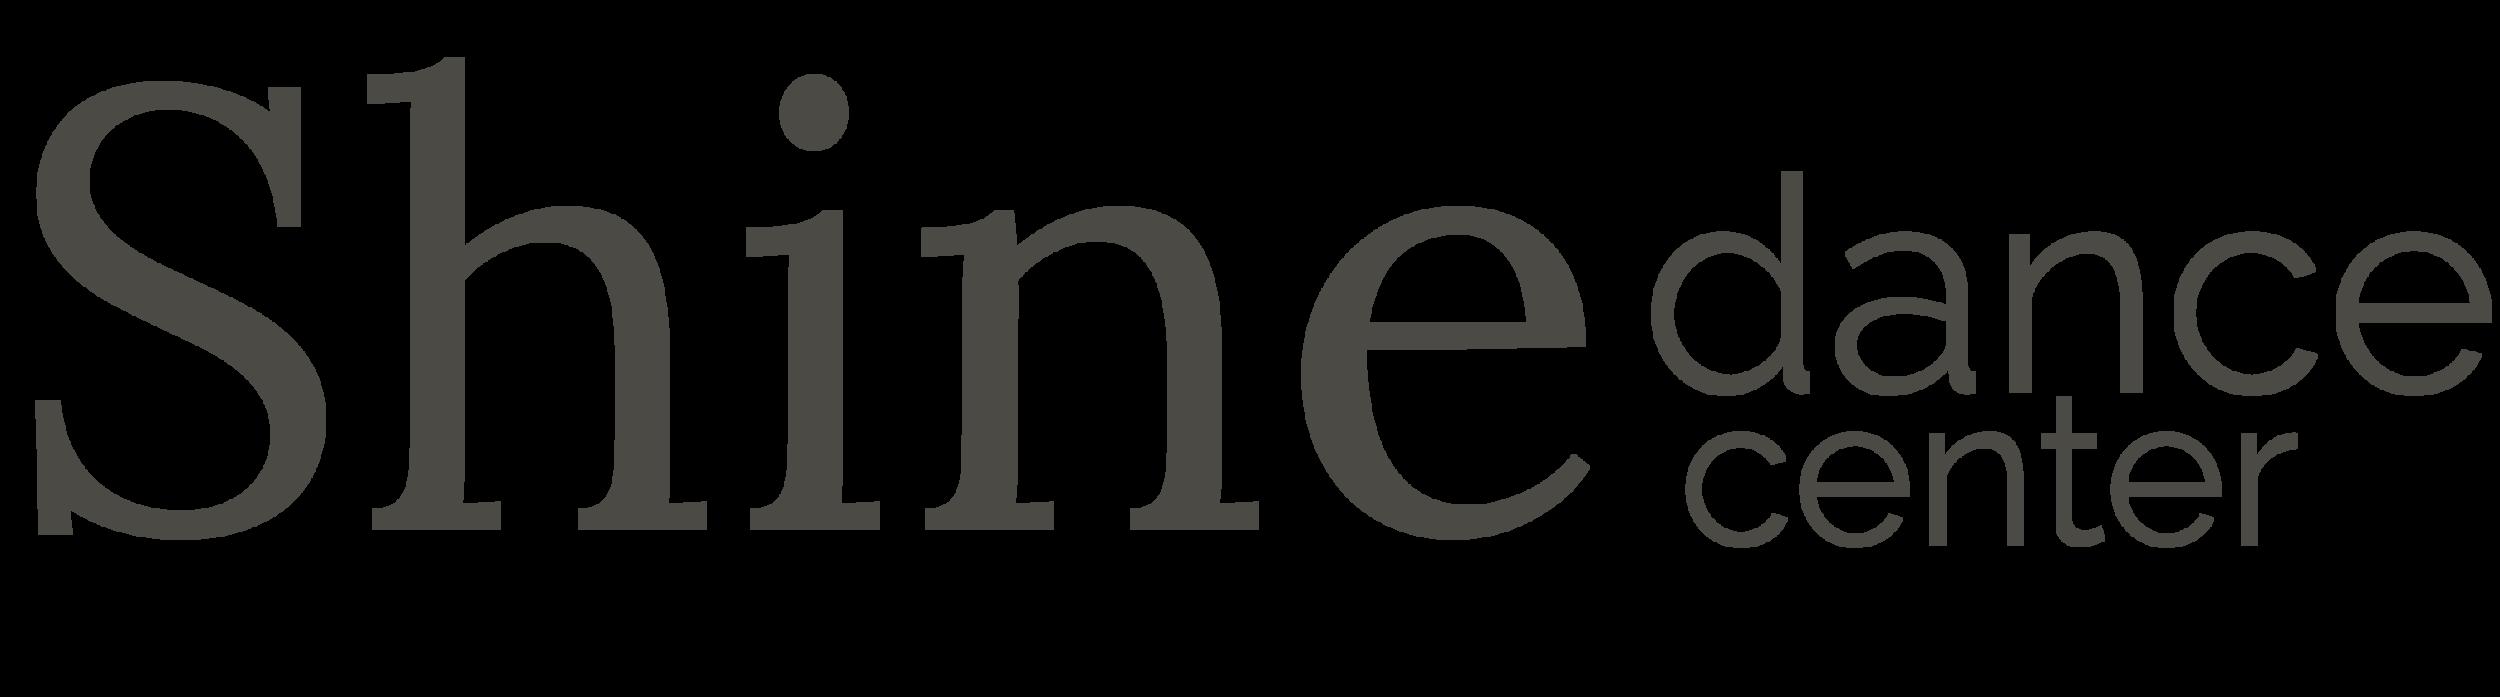 shine_logo_rachel_sanders_black.png